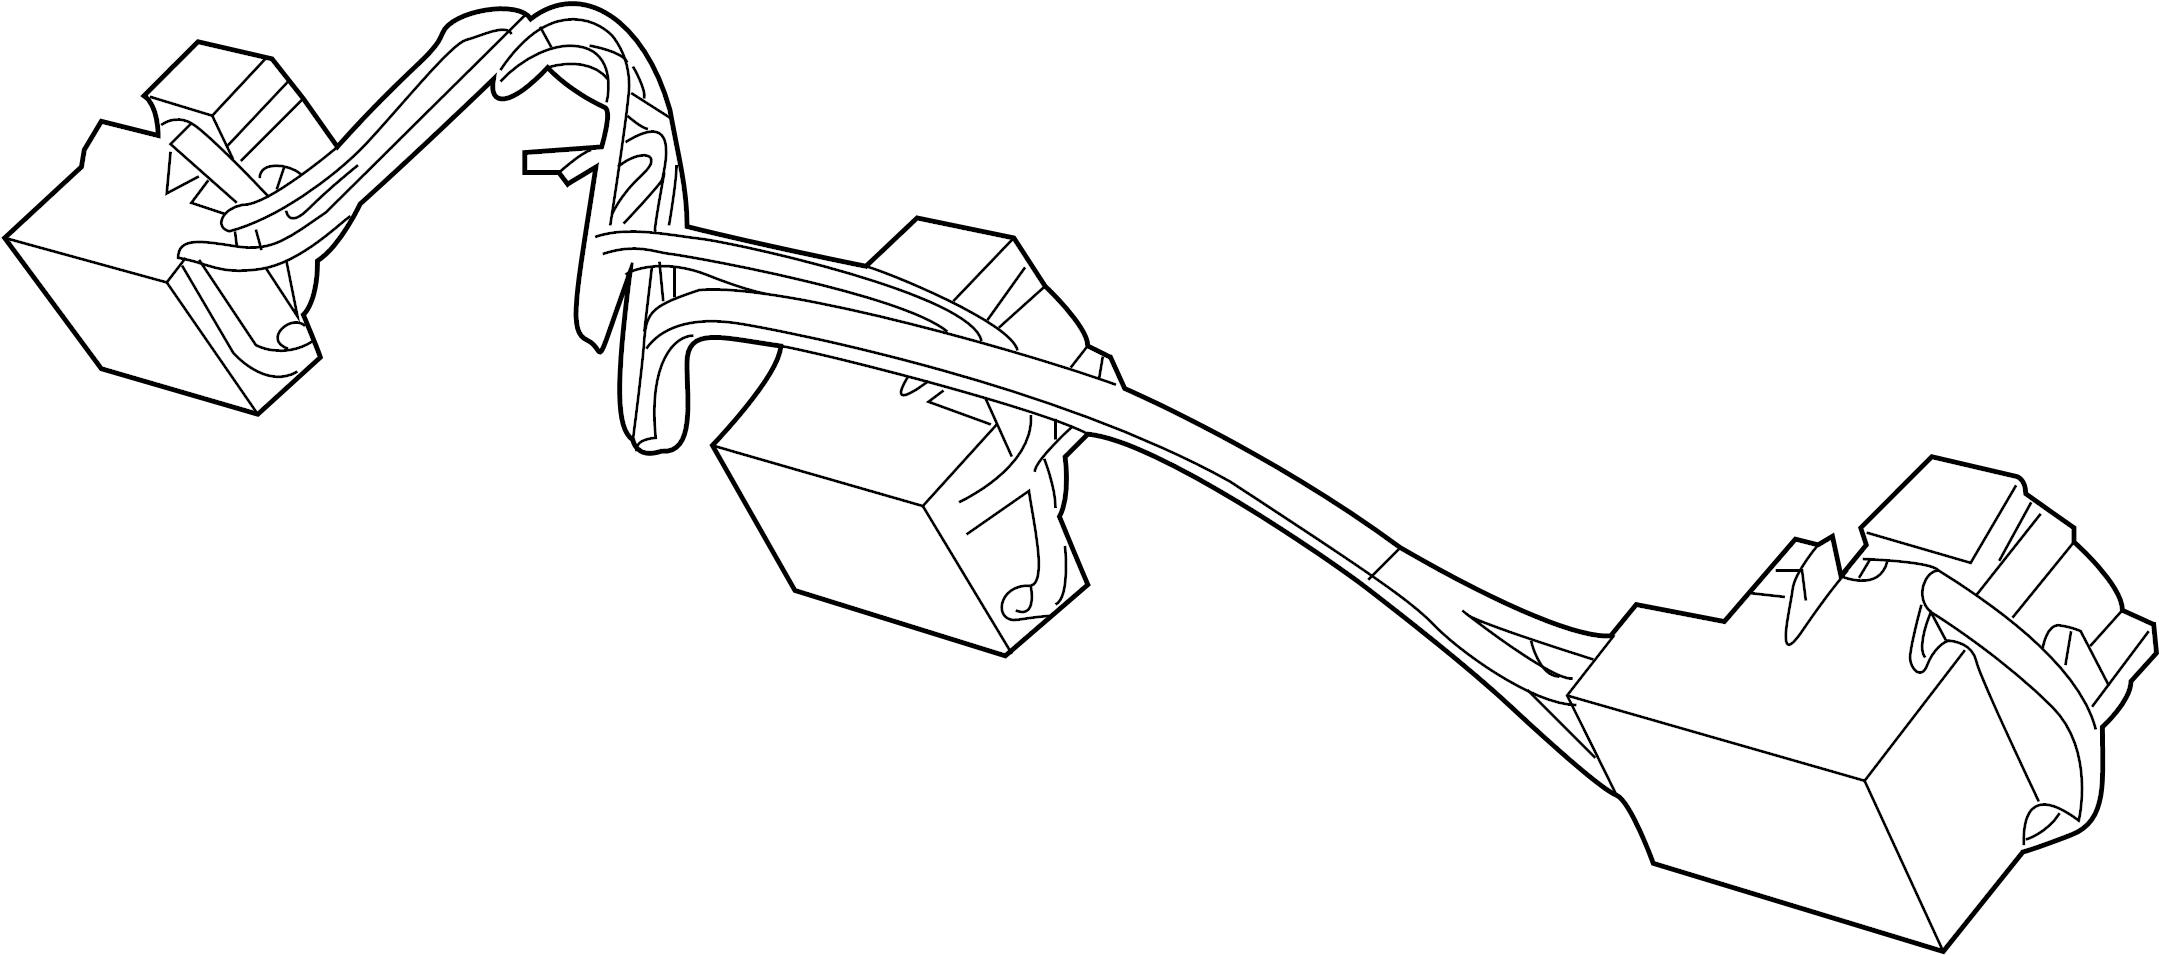 2011 Ram Dakota Harness. Wiring Harness Connector. Dodge